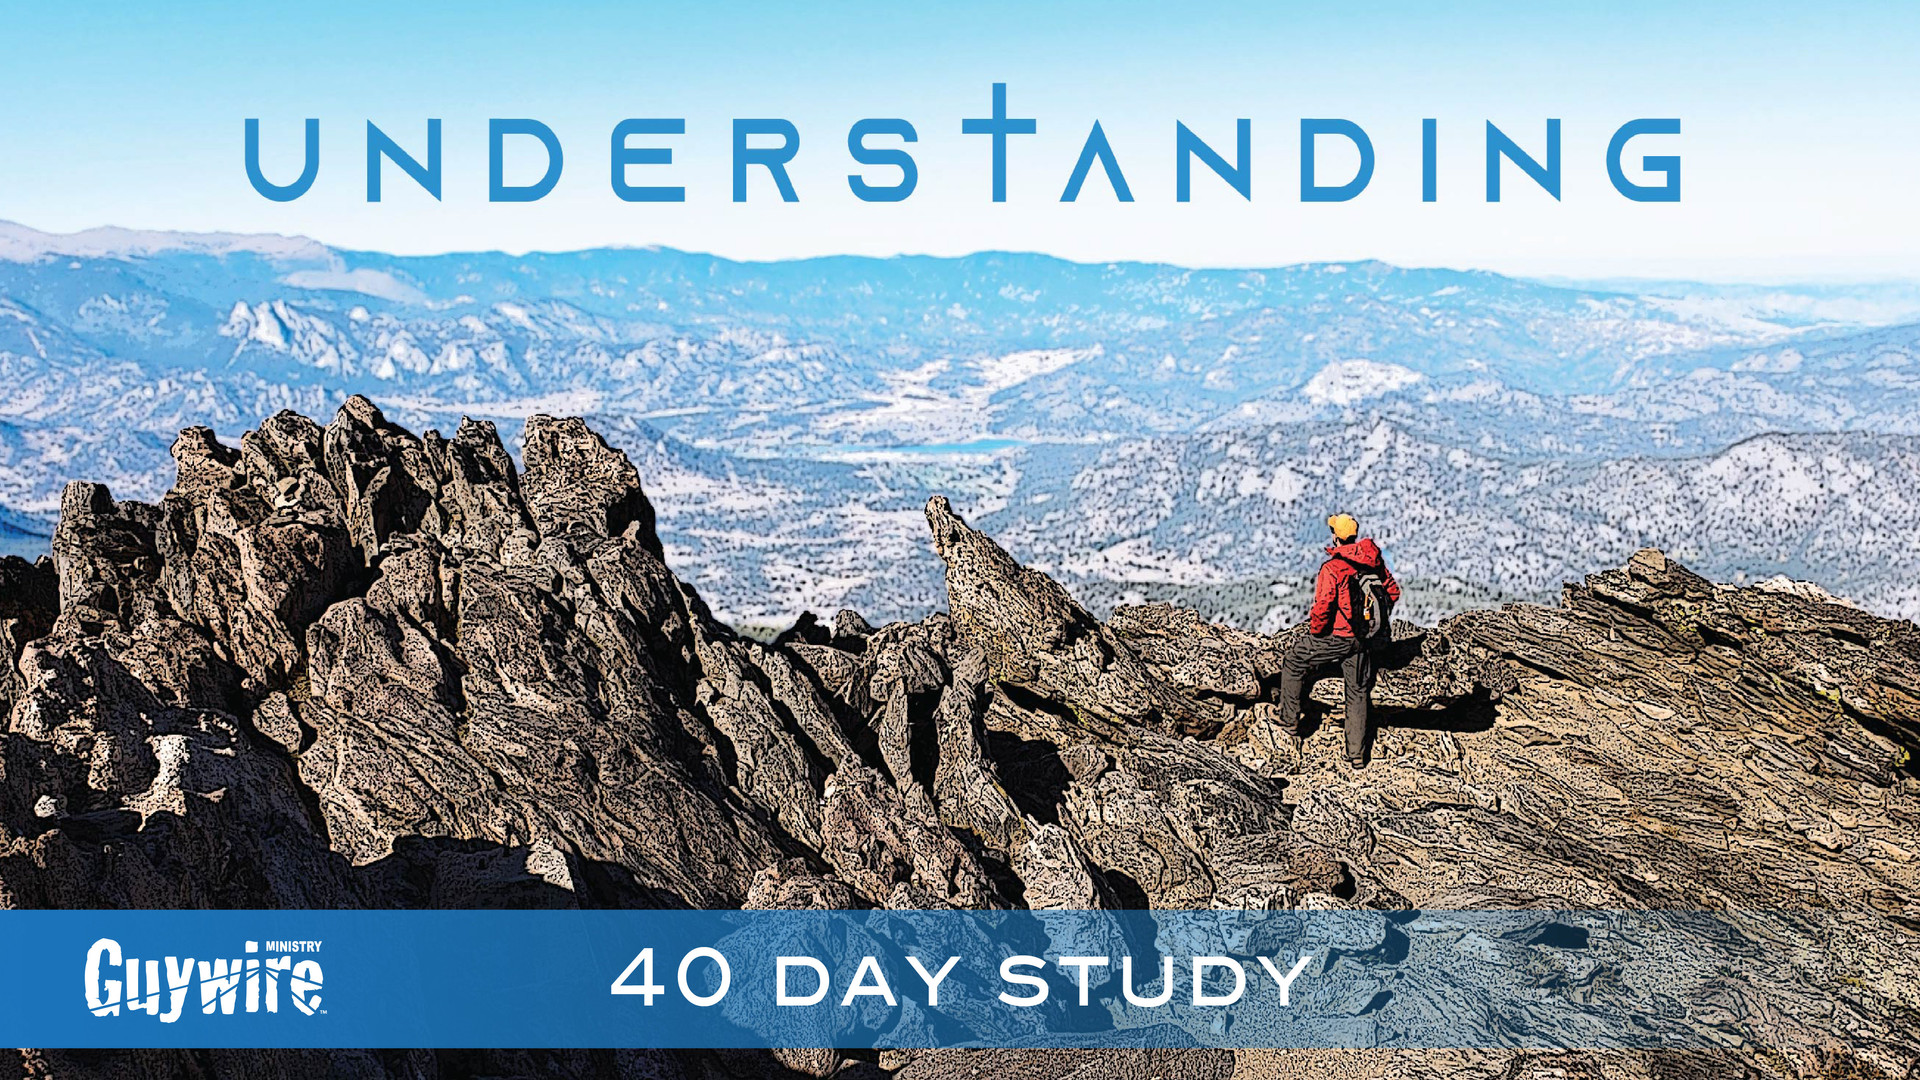 40 Day Study - UNDERSTANDING